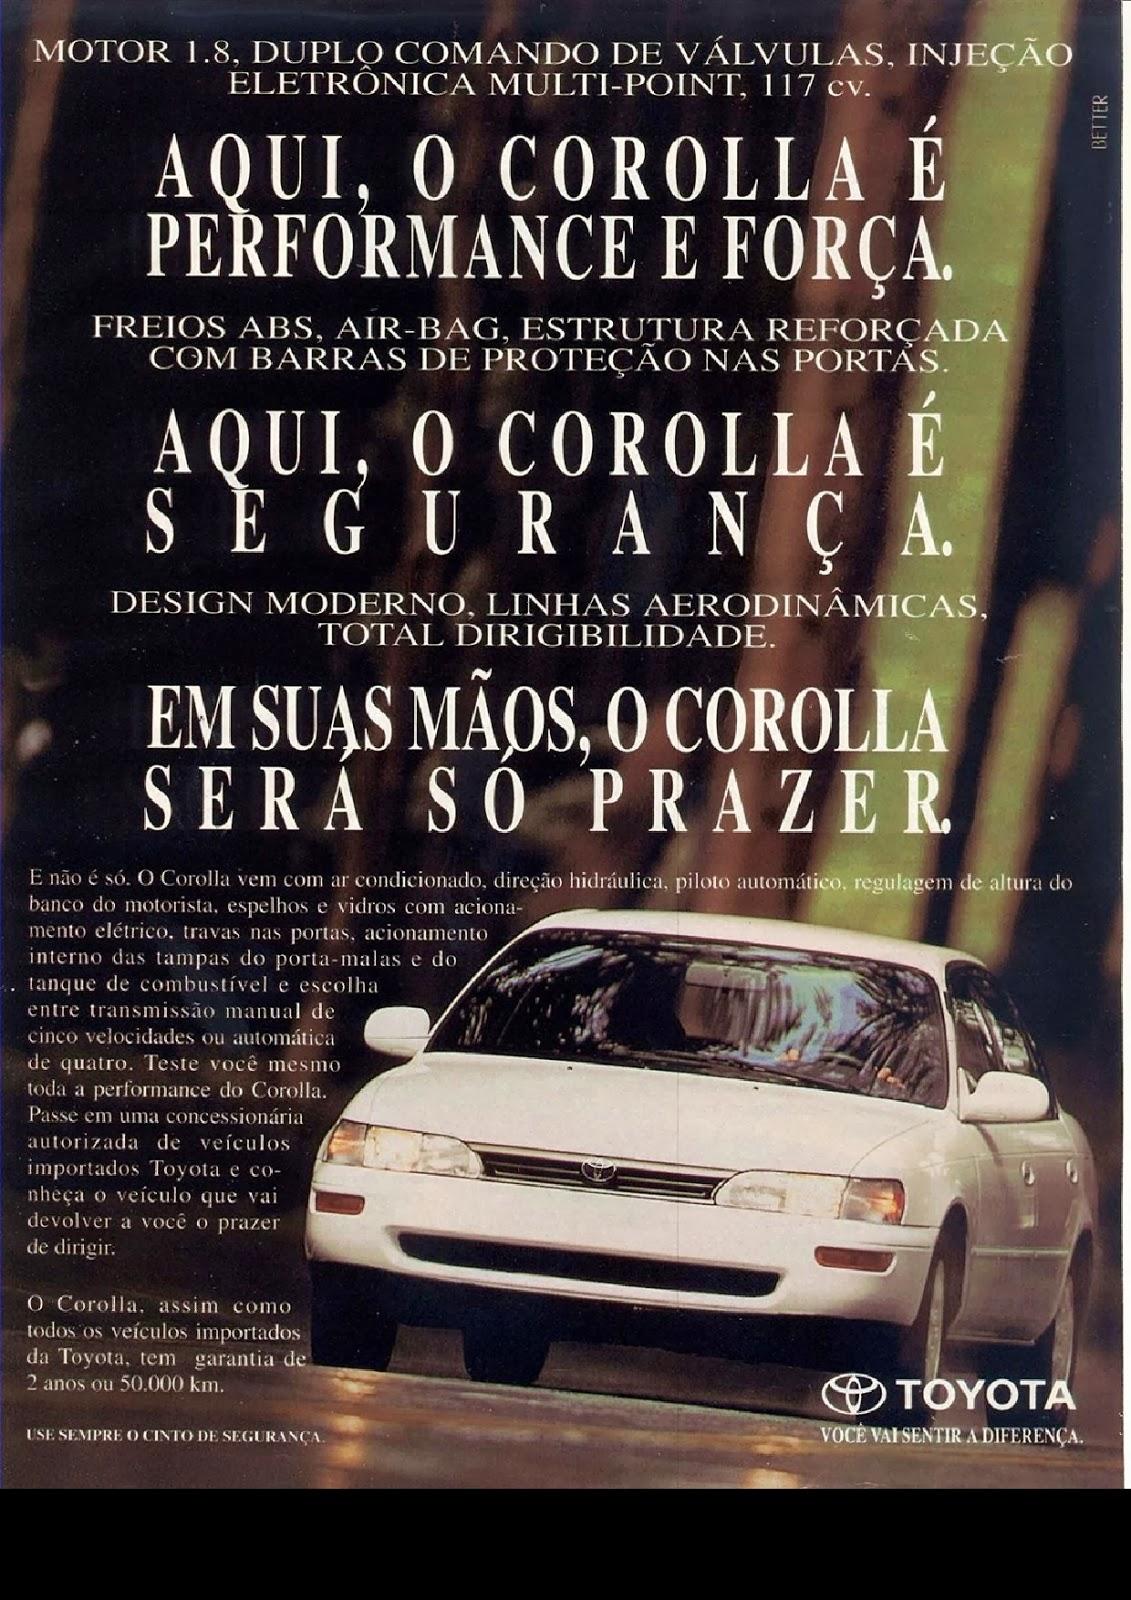 Primeira propaganda do Toyota Corolla no Brasil em 1992